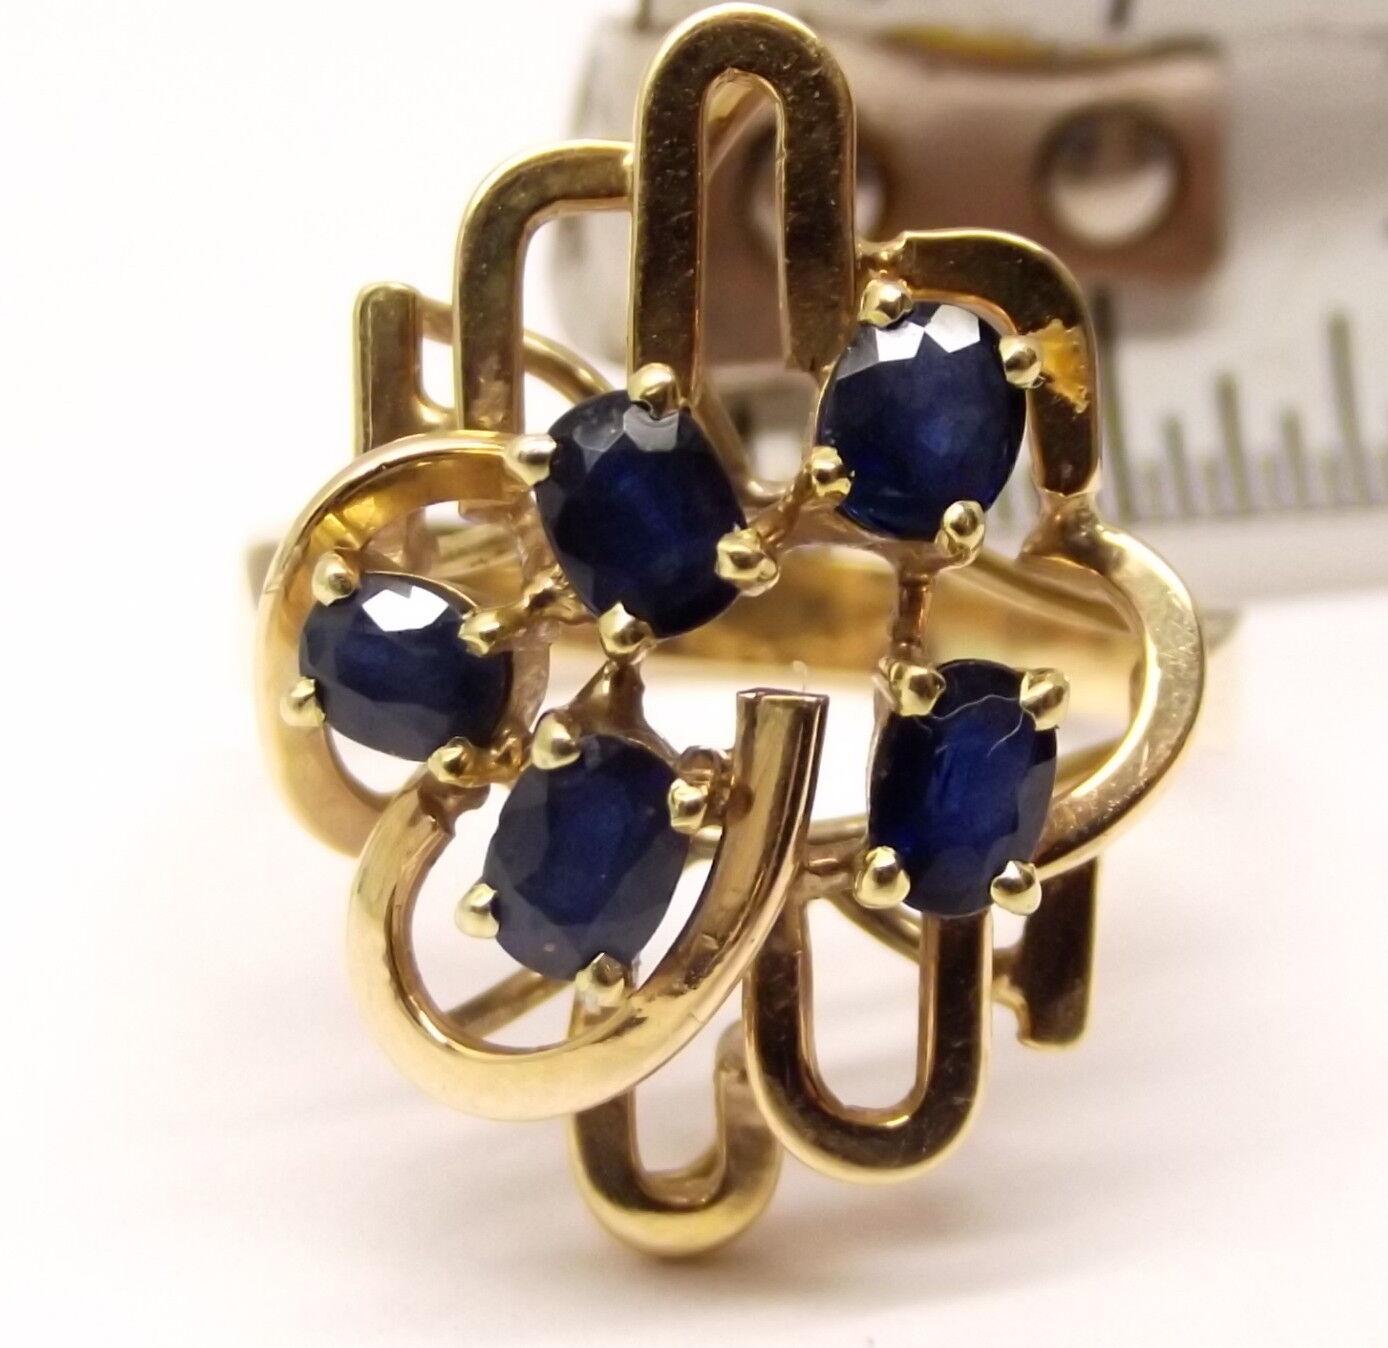 Vtg 14K gold bluee Sapphire Cluster Ring Sz 9.5 Estate Ornate Spiral Modernist